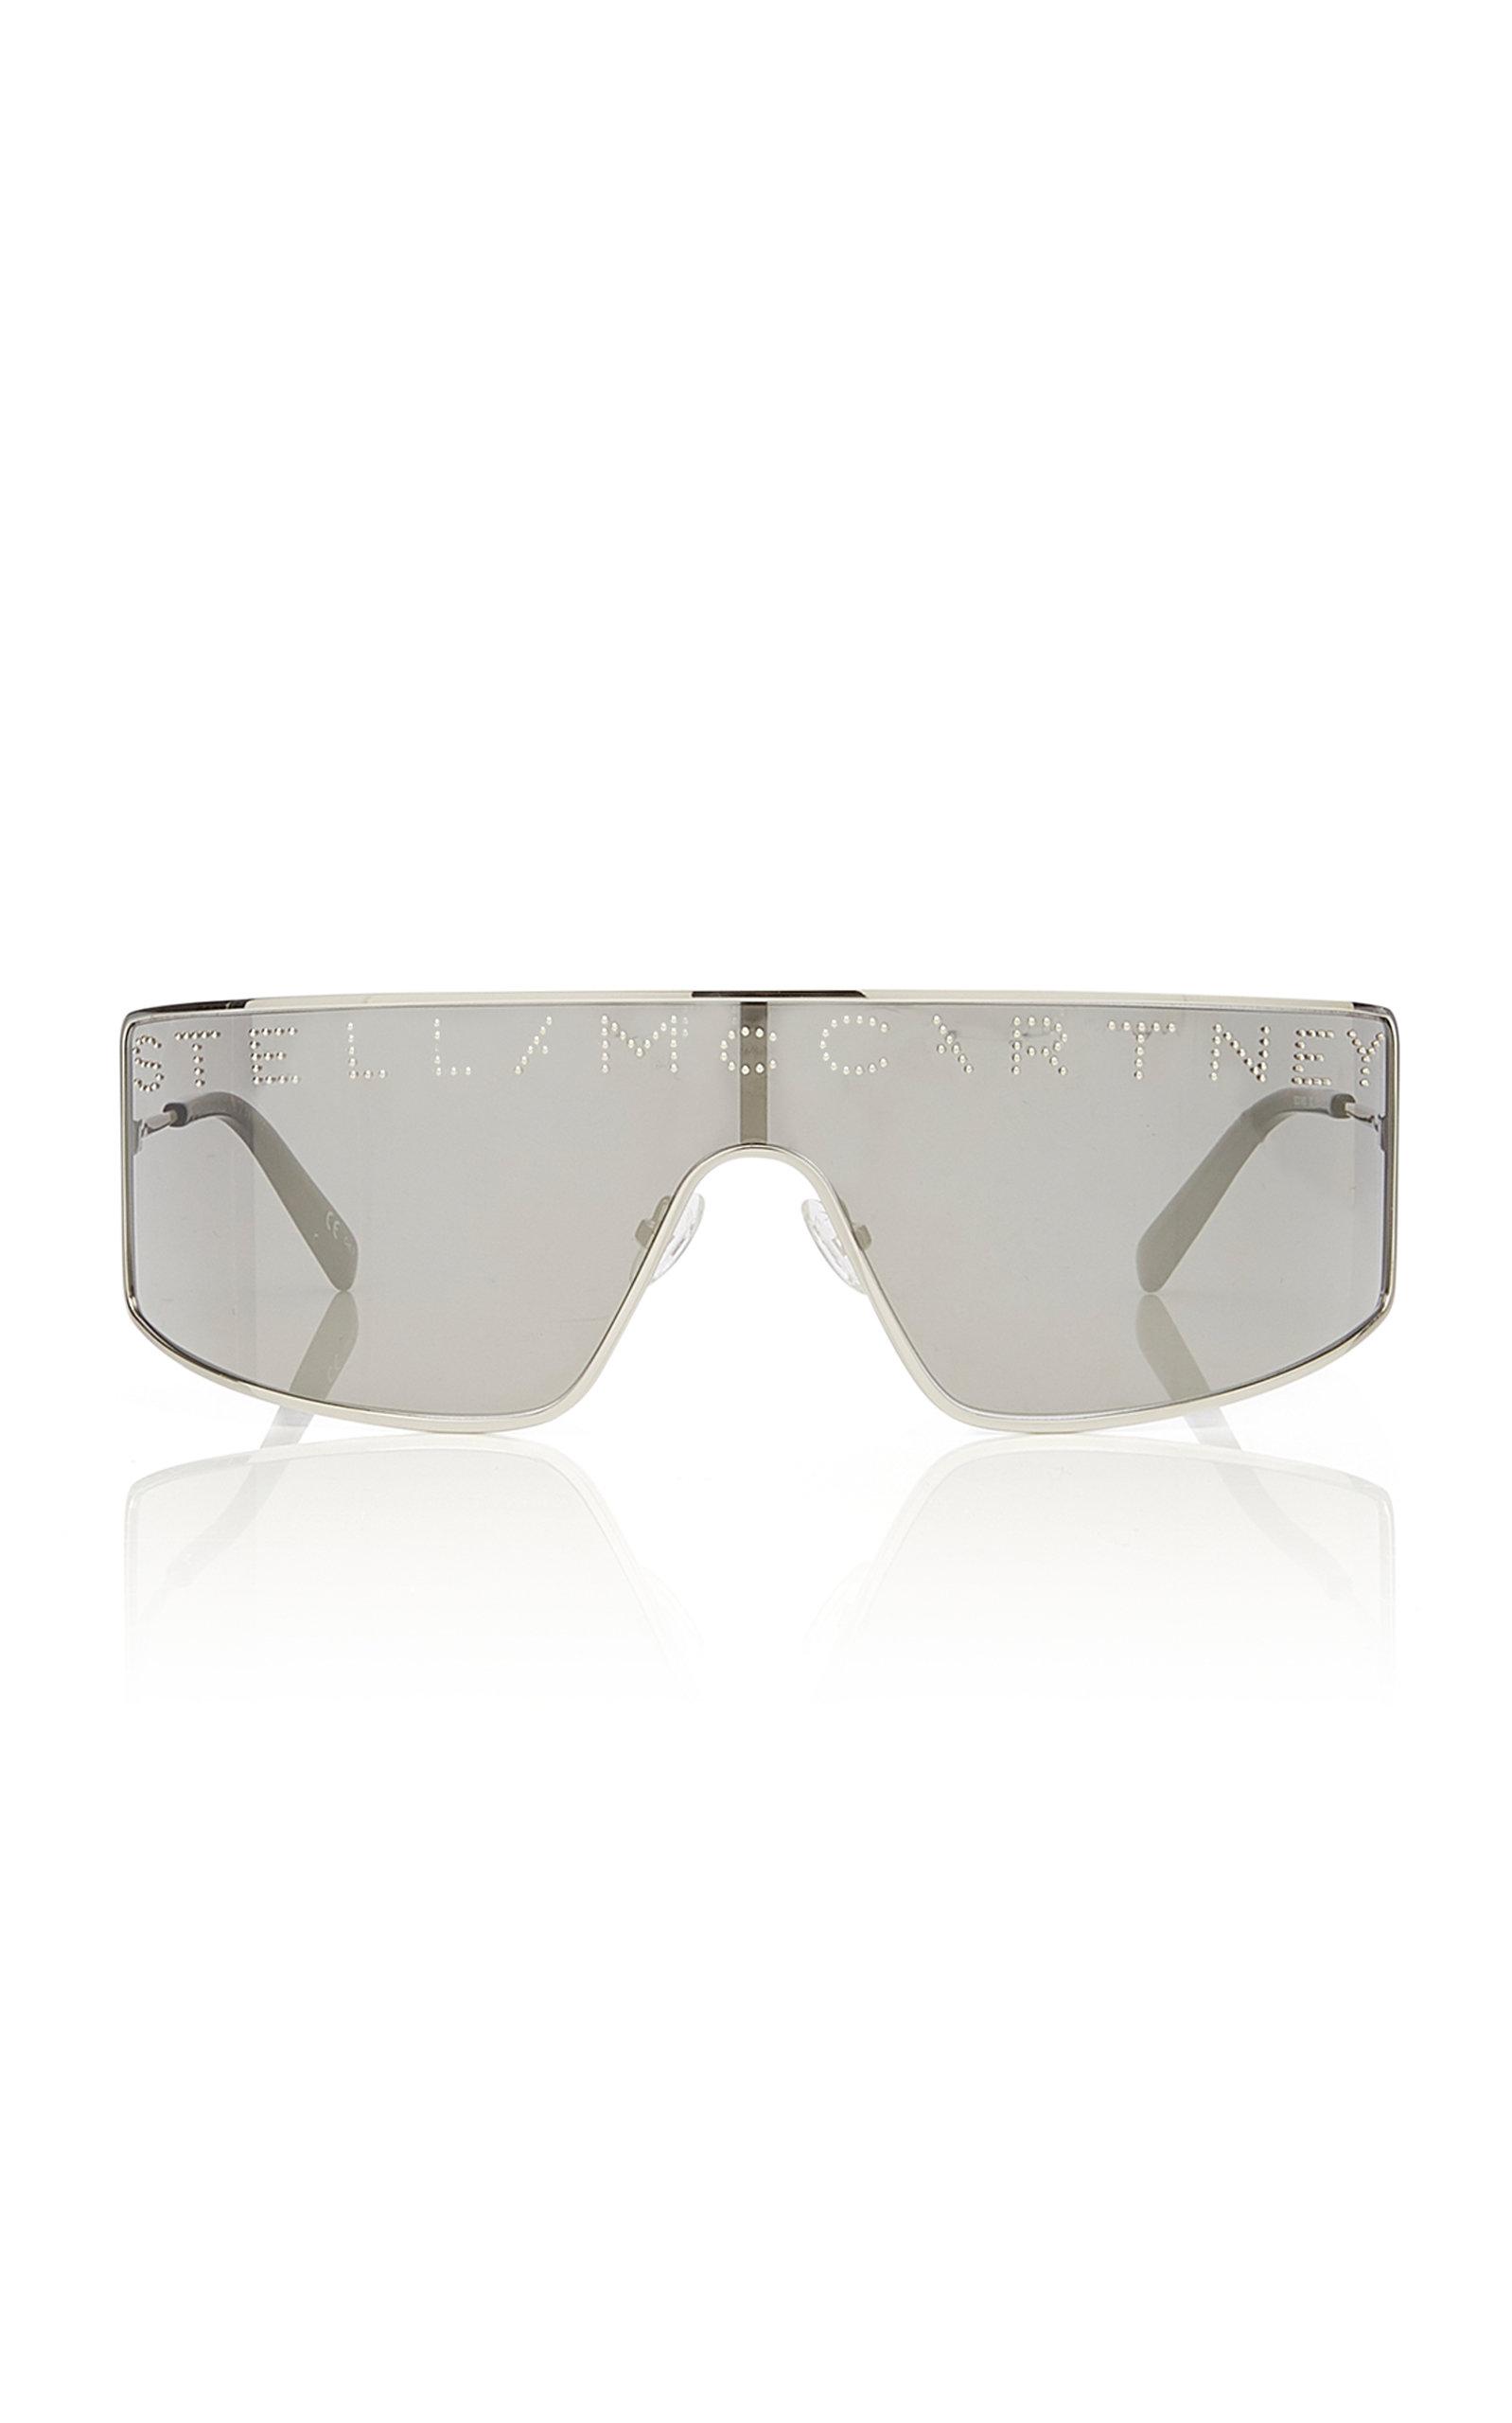 3093e0e799 Stella McCartney SunglassesLogo Stud-Embellished Silver-Tone Sunglasses